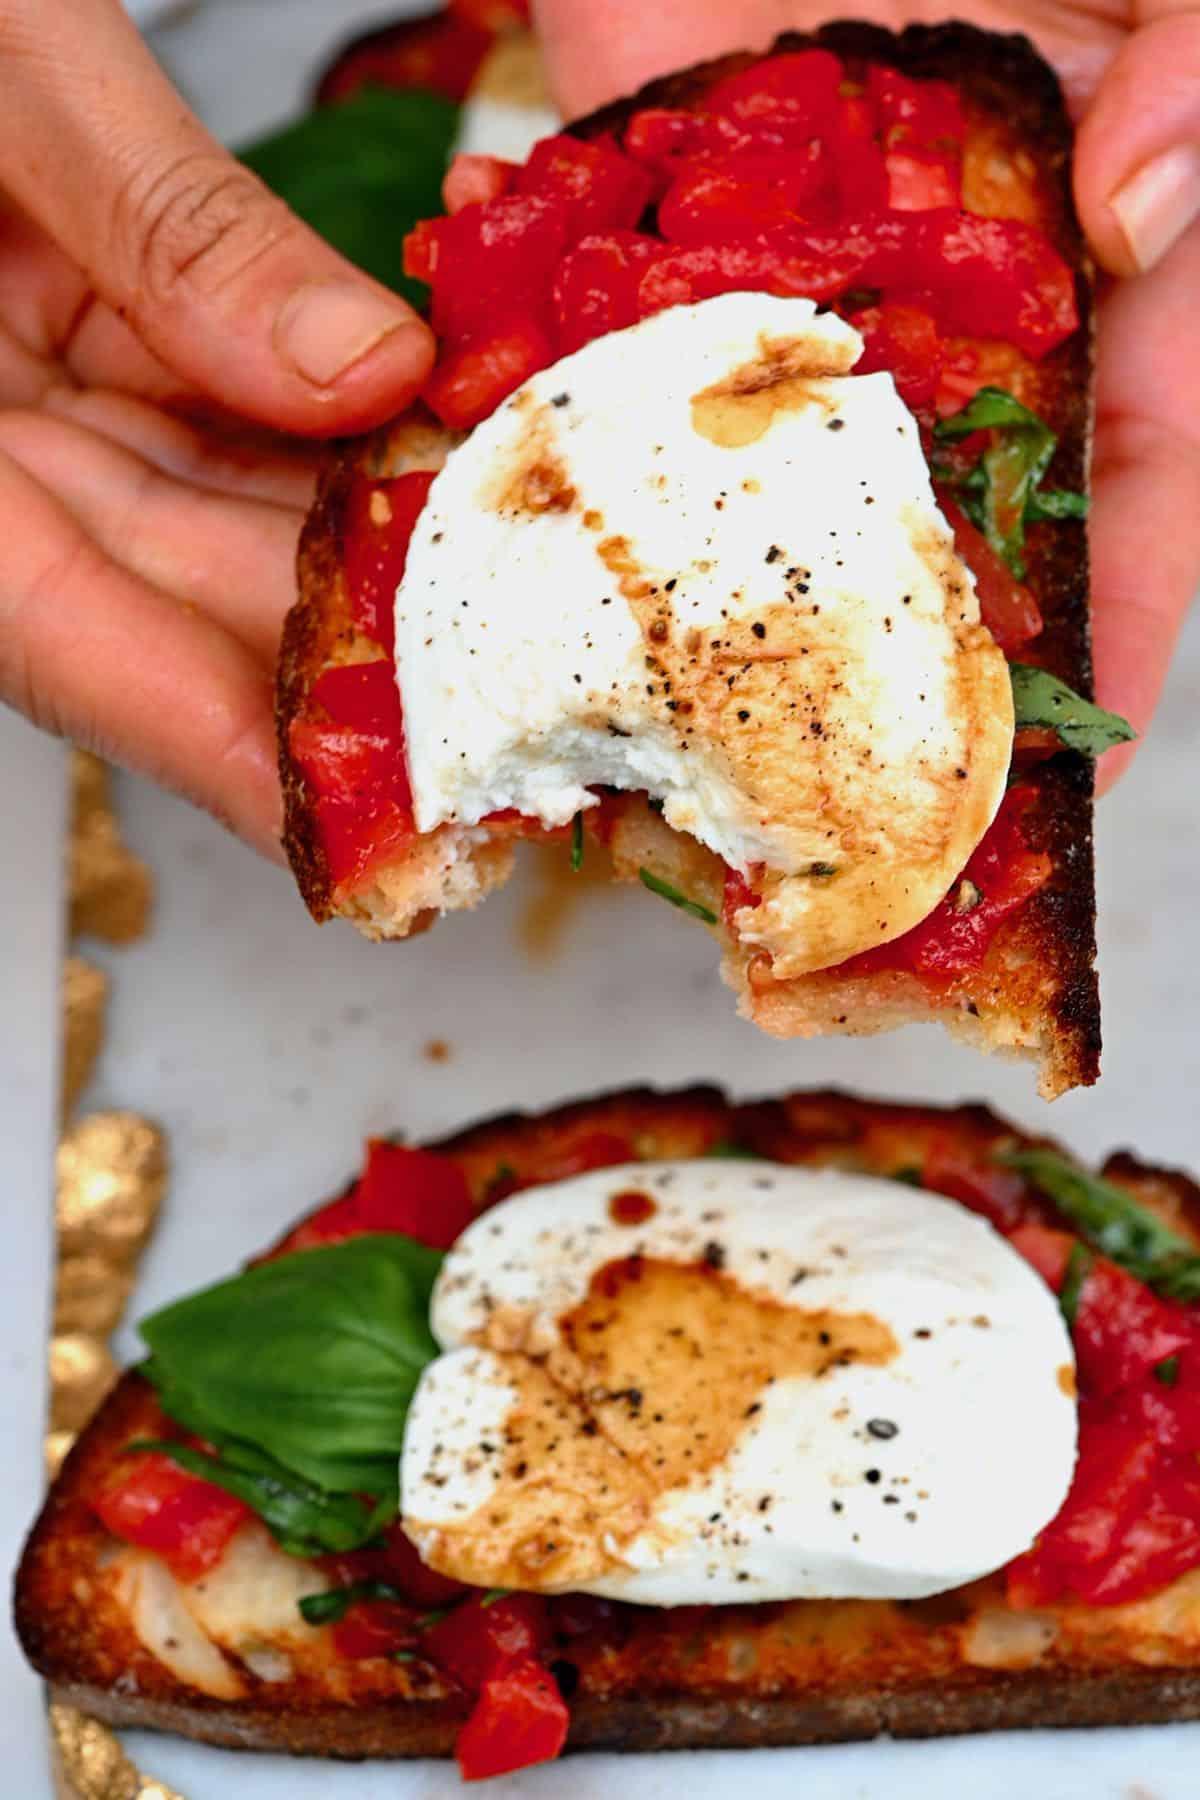 Mozzarella bruschetta with a bitten off piece